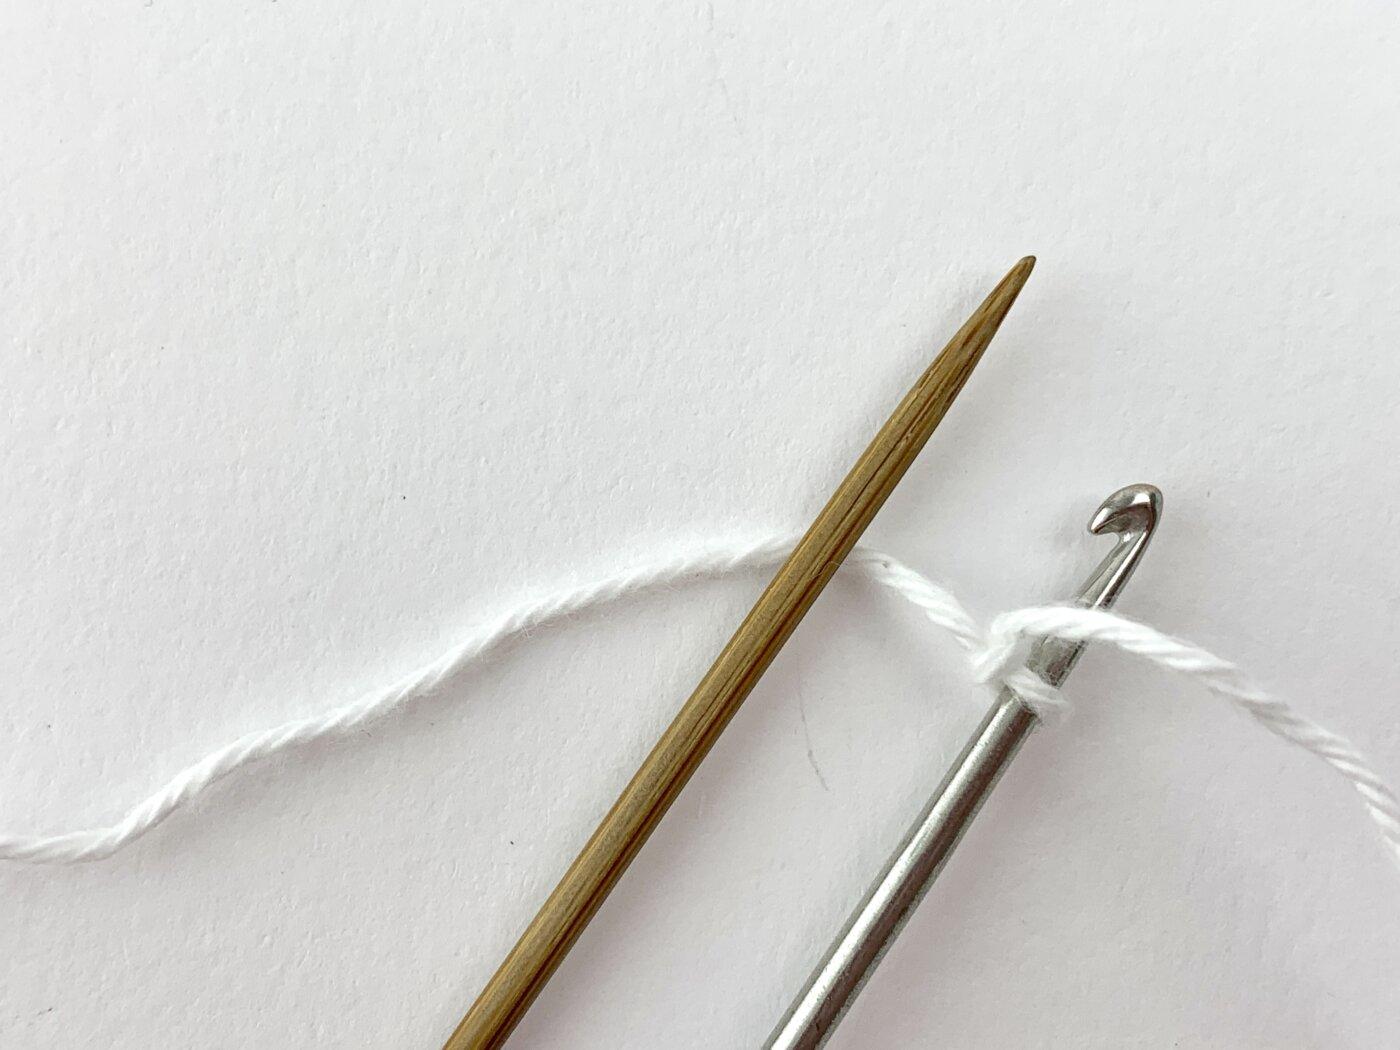 Der Arbeitsfaden hinter der Stricknadel des Nadelspiels